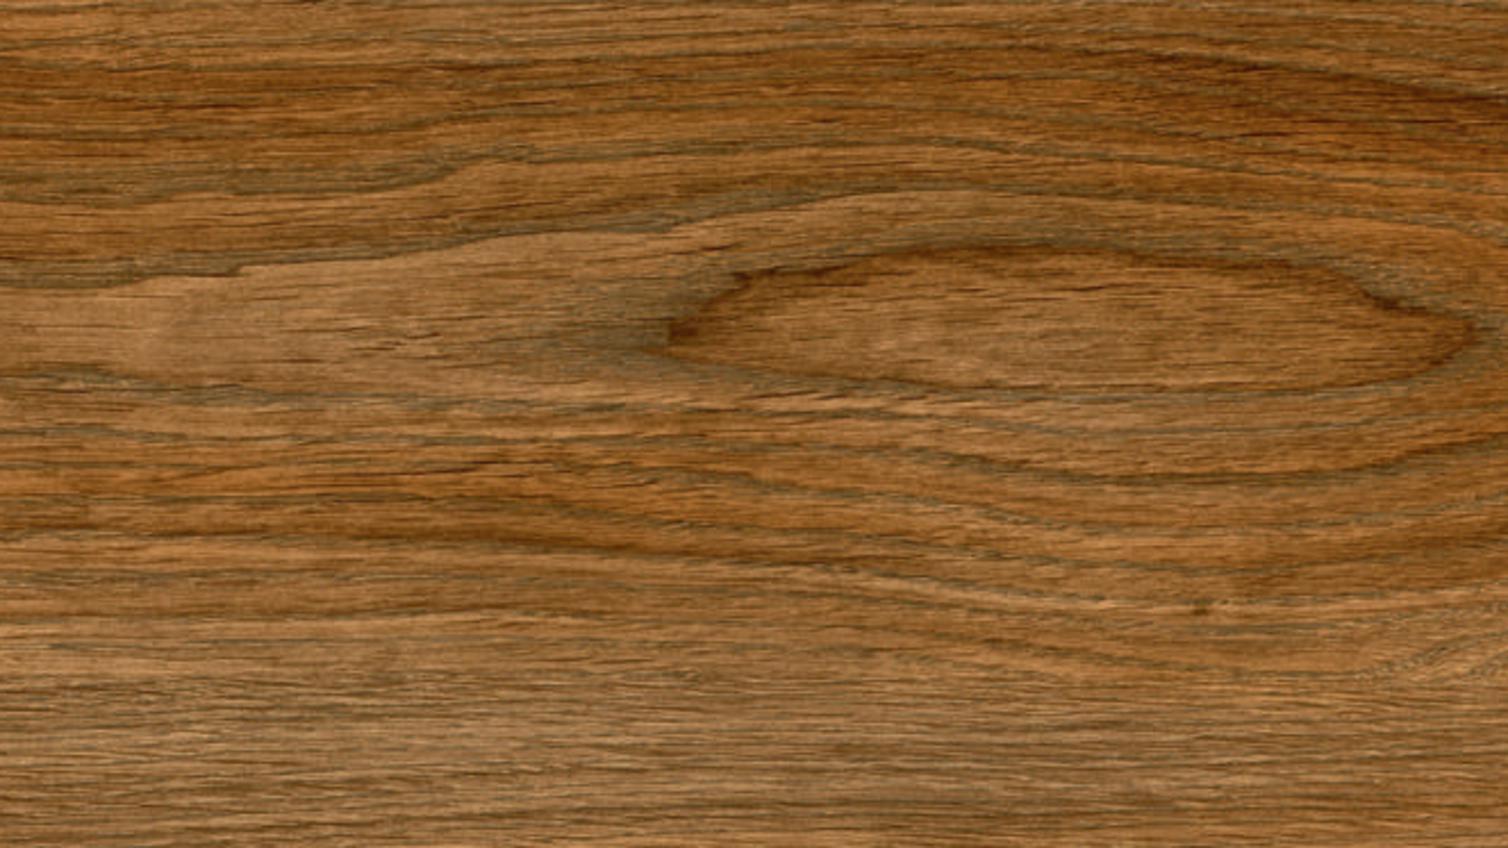 Howdens Professional Single Plank Honey Oak Luxury Vinyl